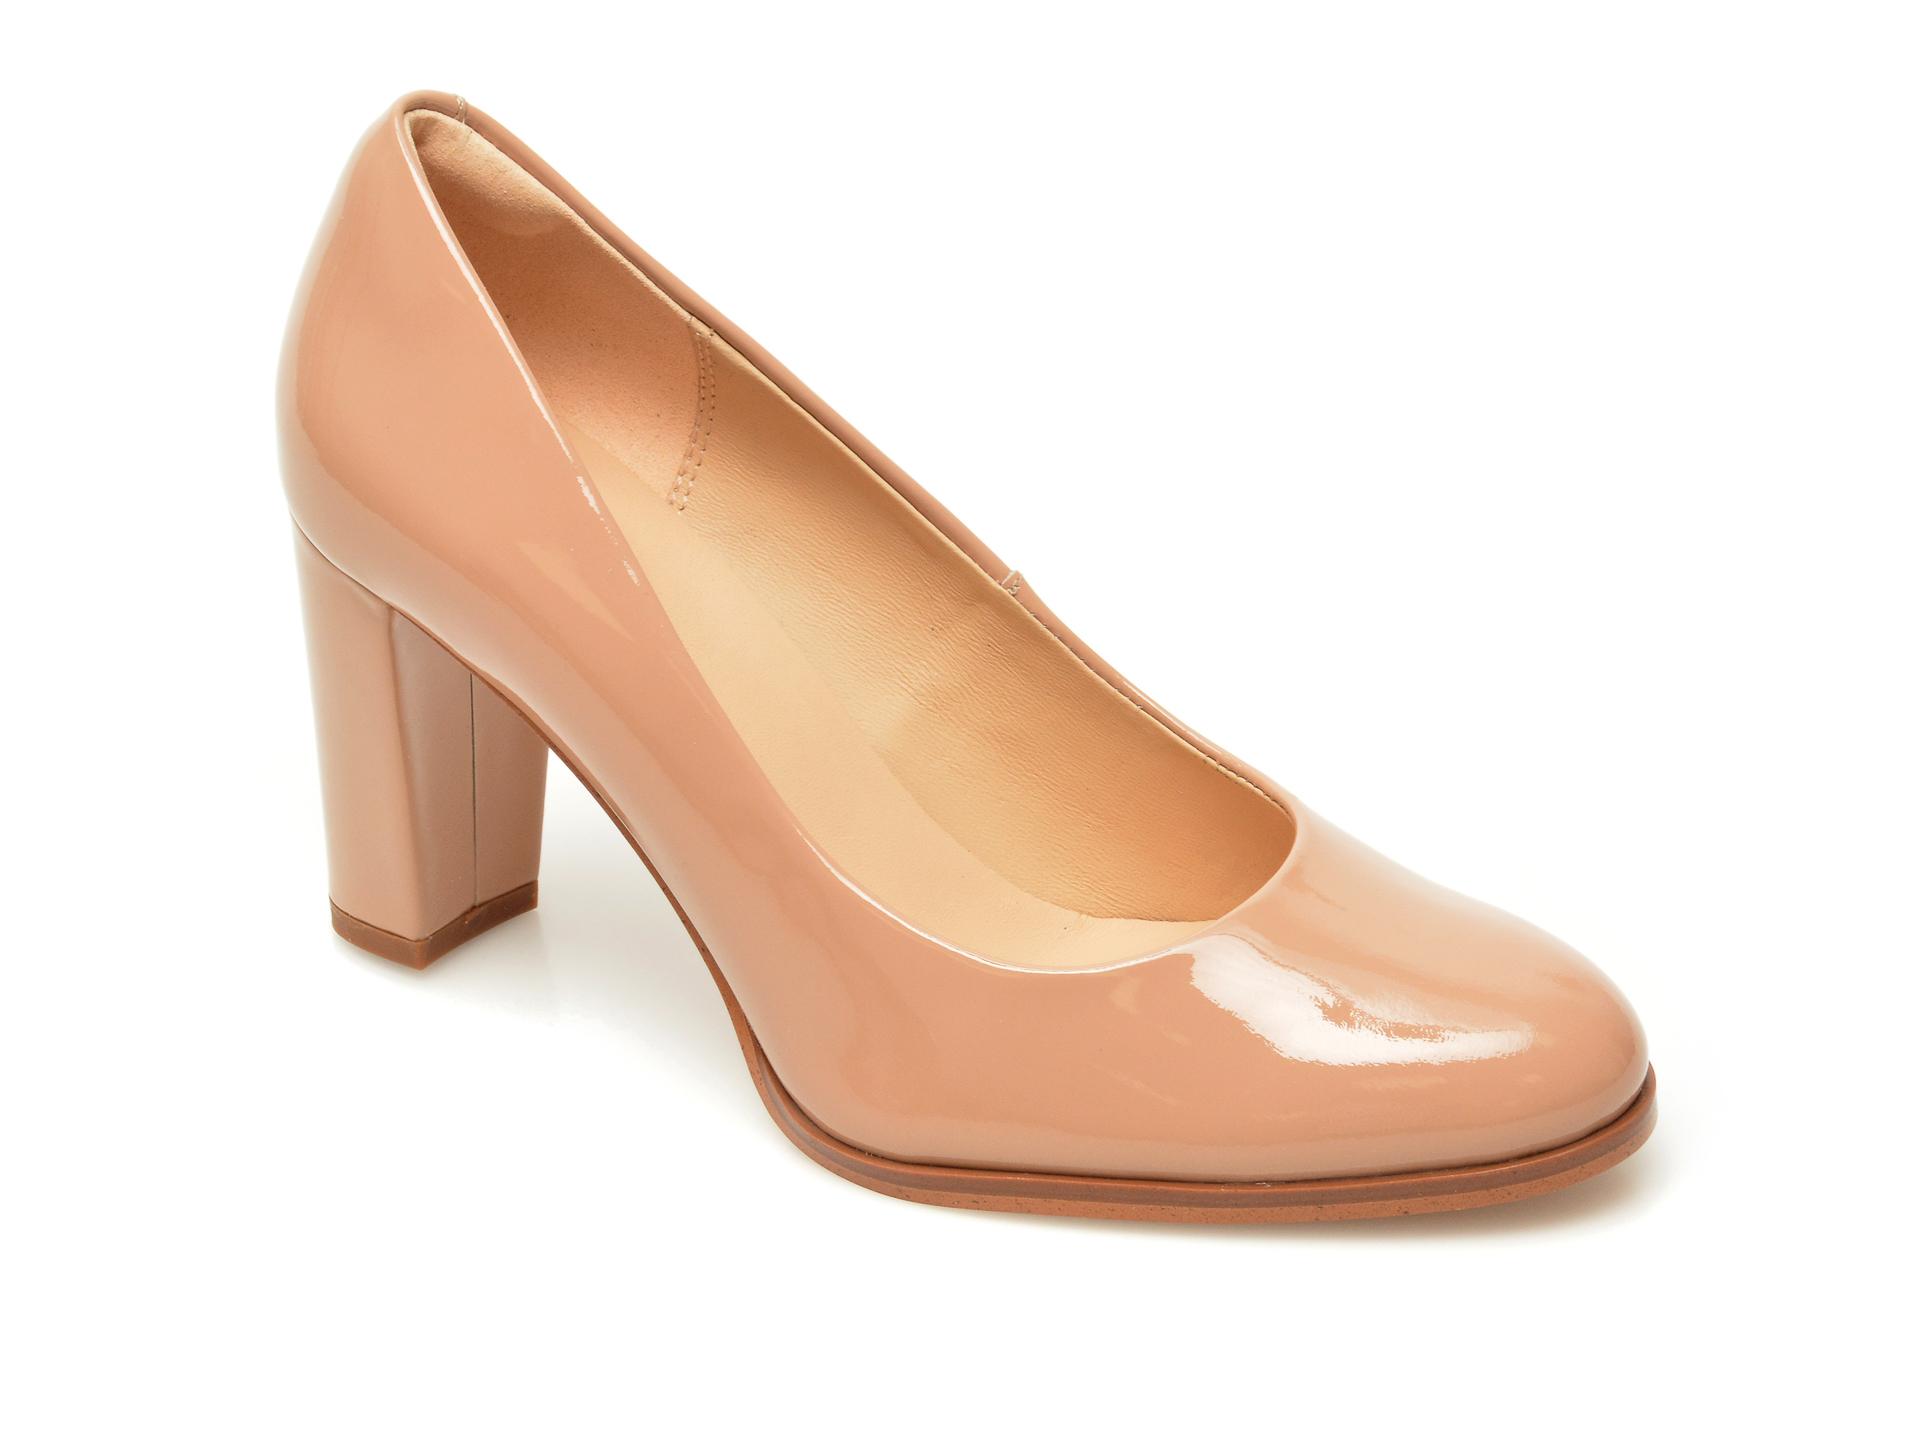 Pantofi CLARKS bej, Kaylin Cara 2, din piele naturala lacuita imagine otter.ro 2021